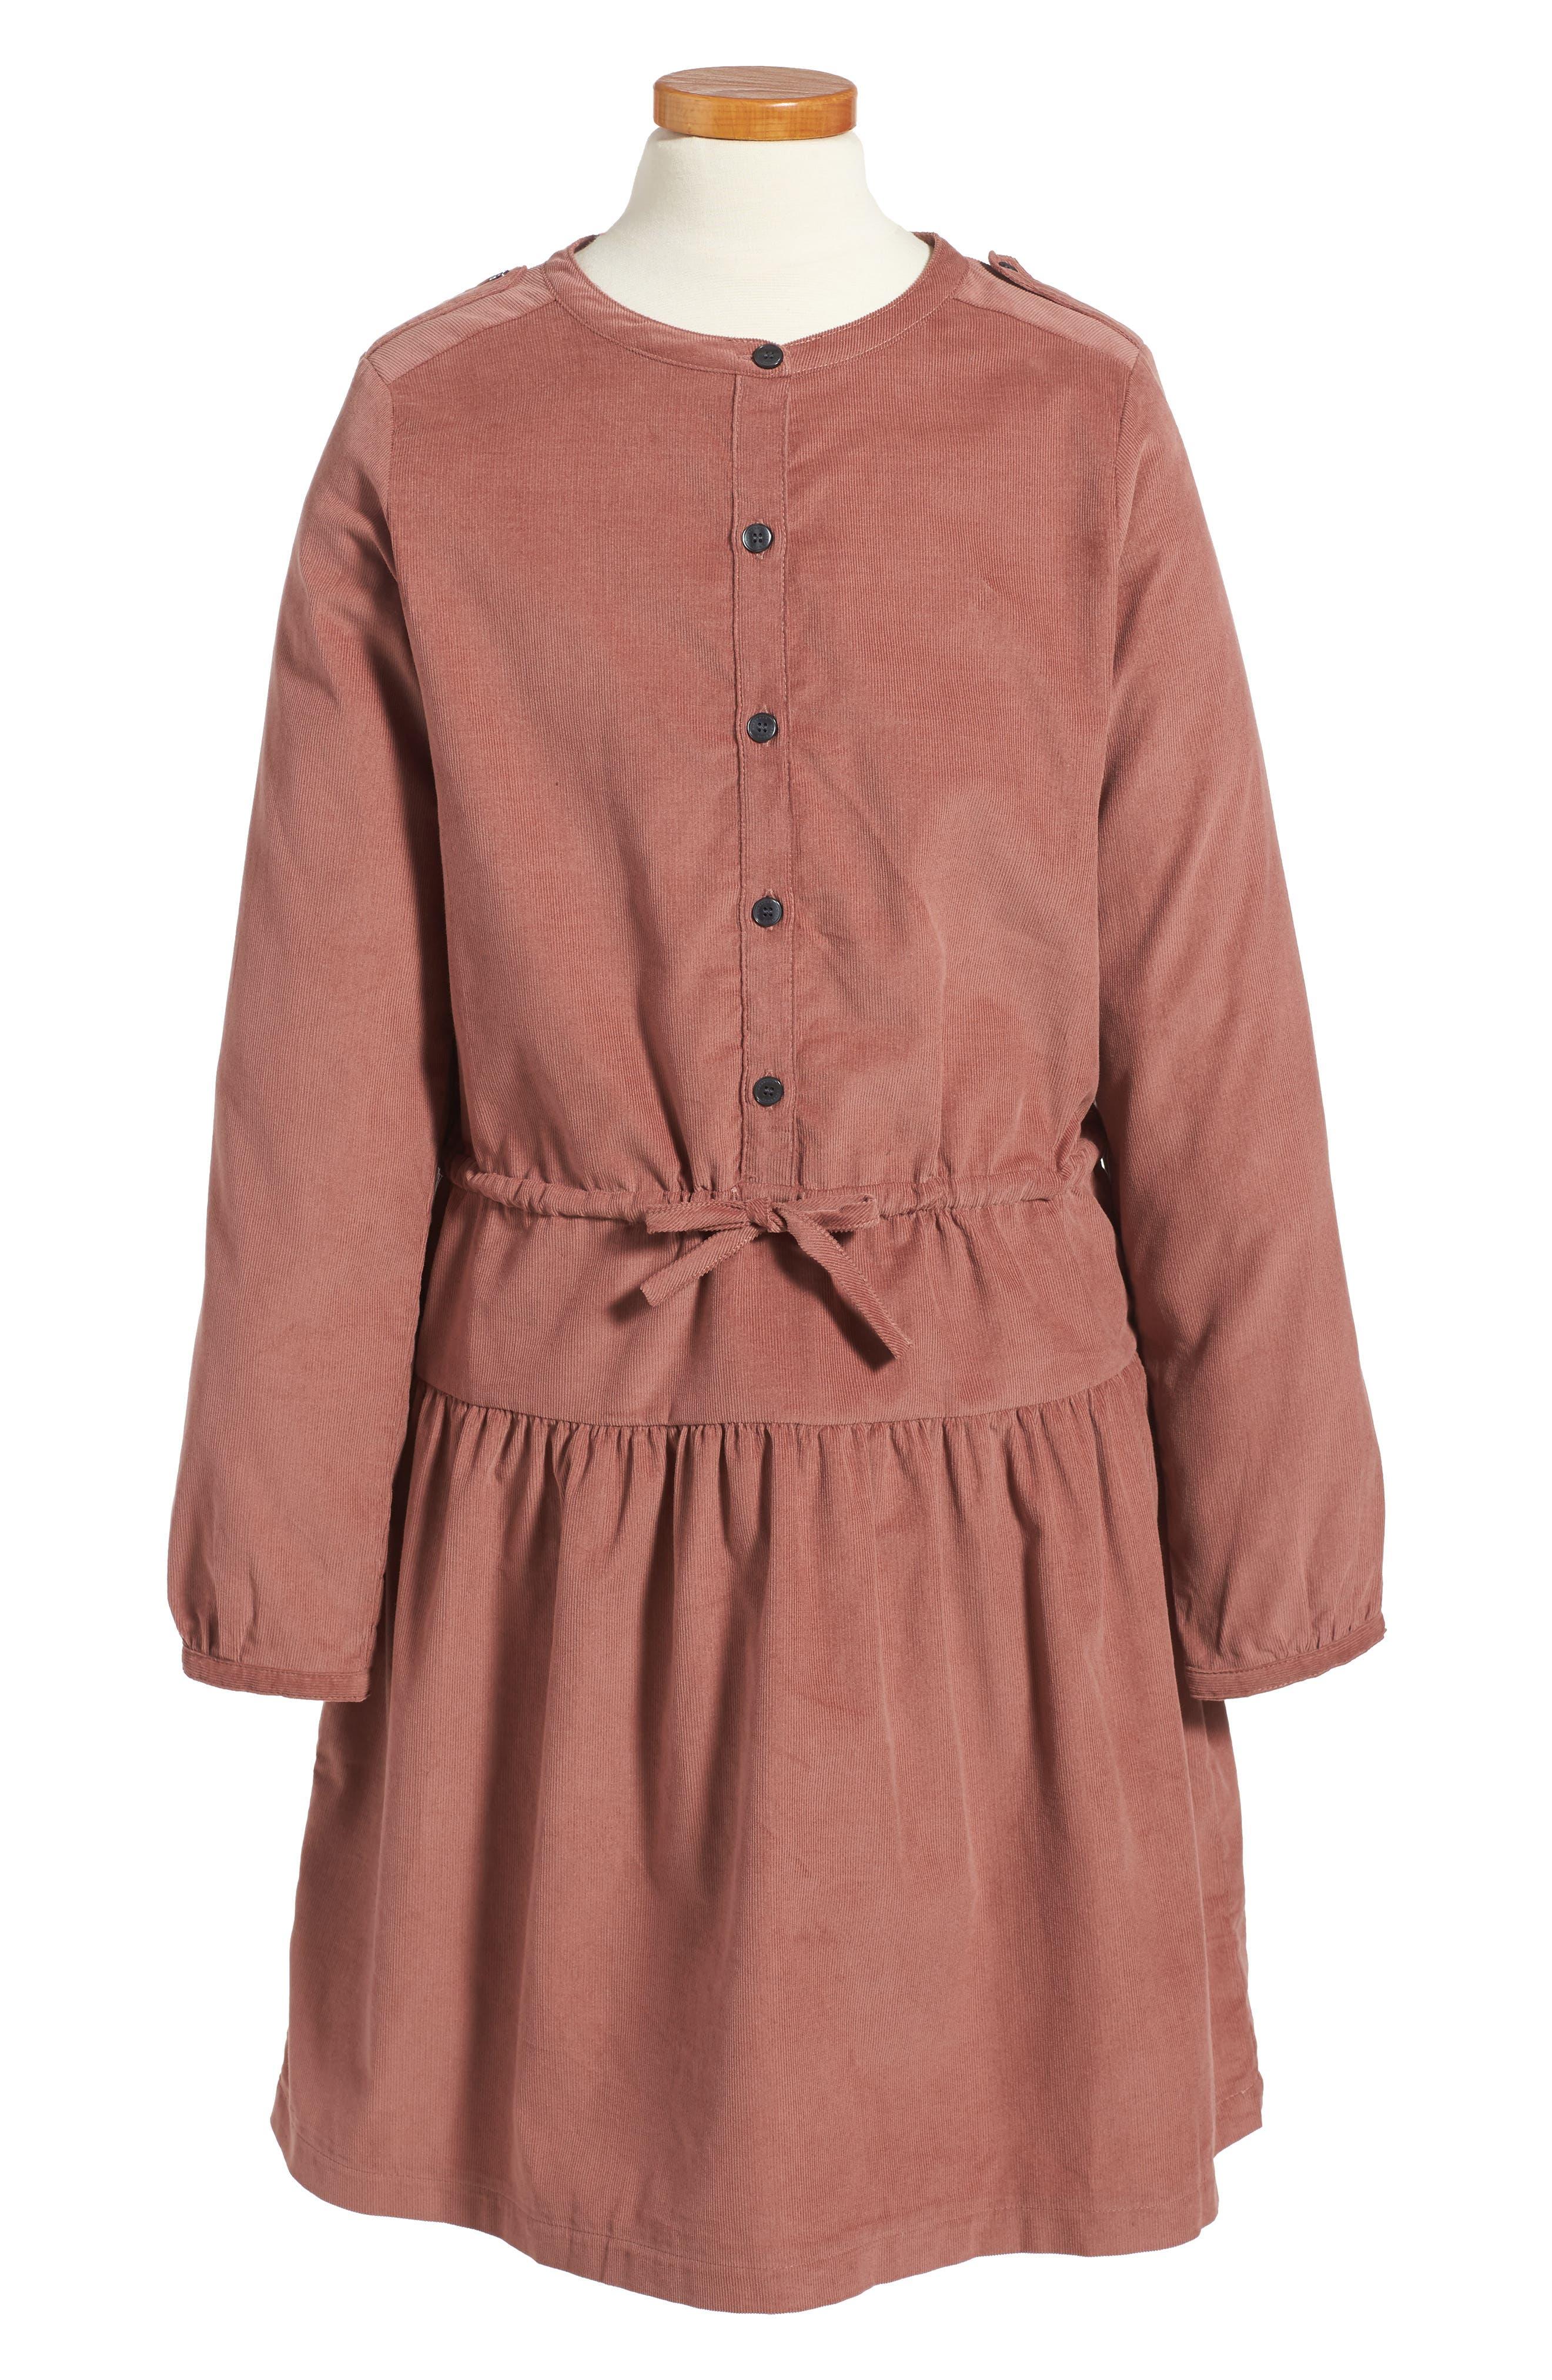 BURBERRY,                             Celestine Corduroy Dress,                             Main thumbnail 1, color,                             930